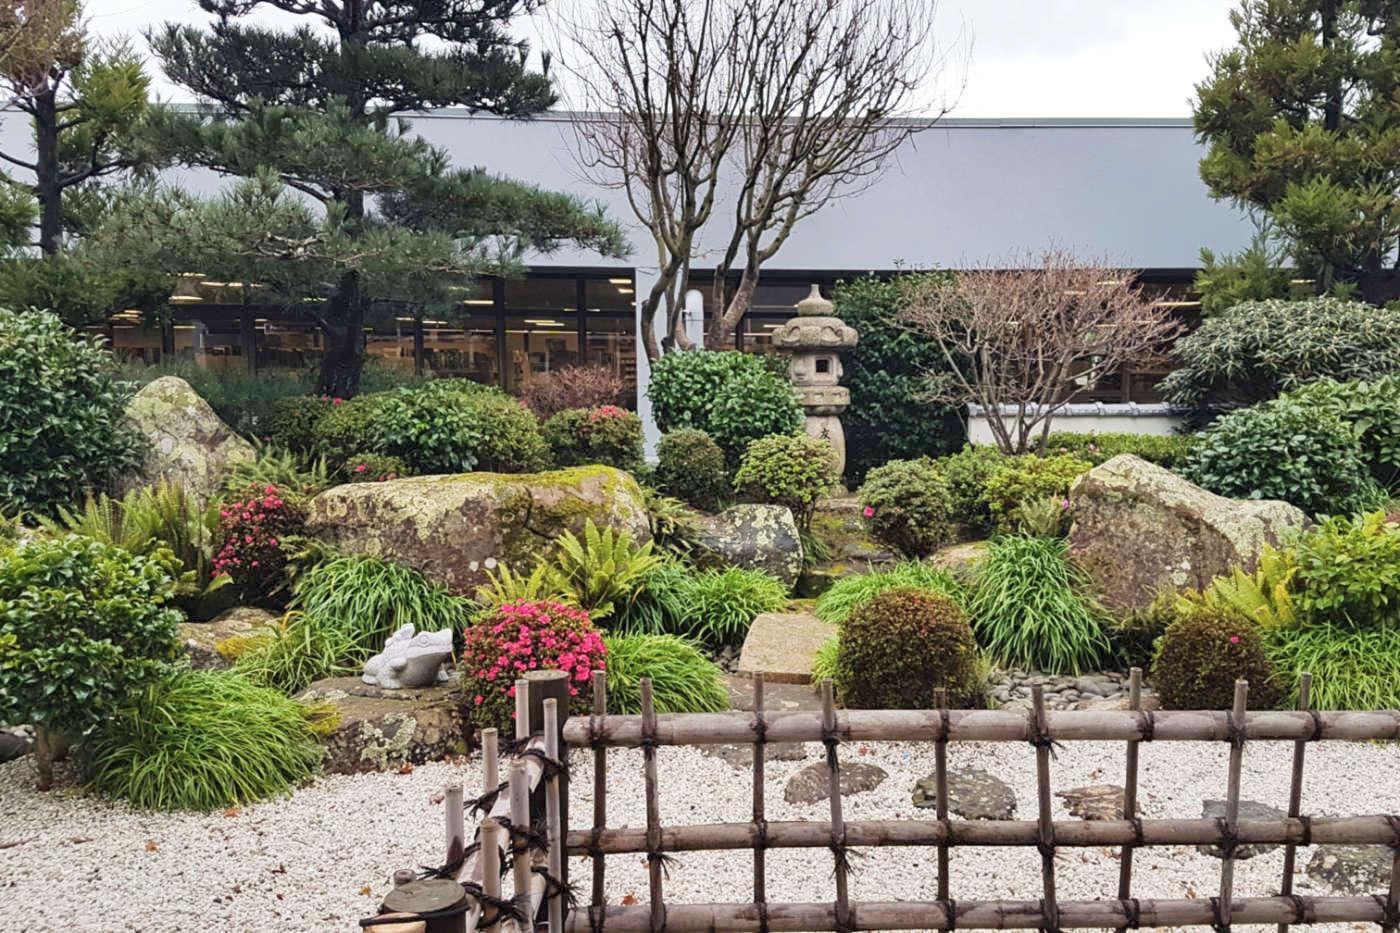 Cafe Kaizen - Zen garden